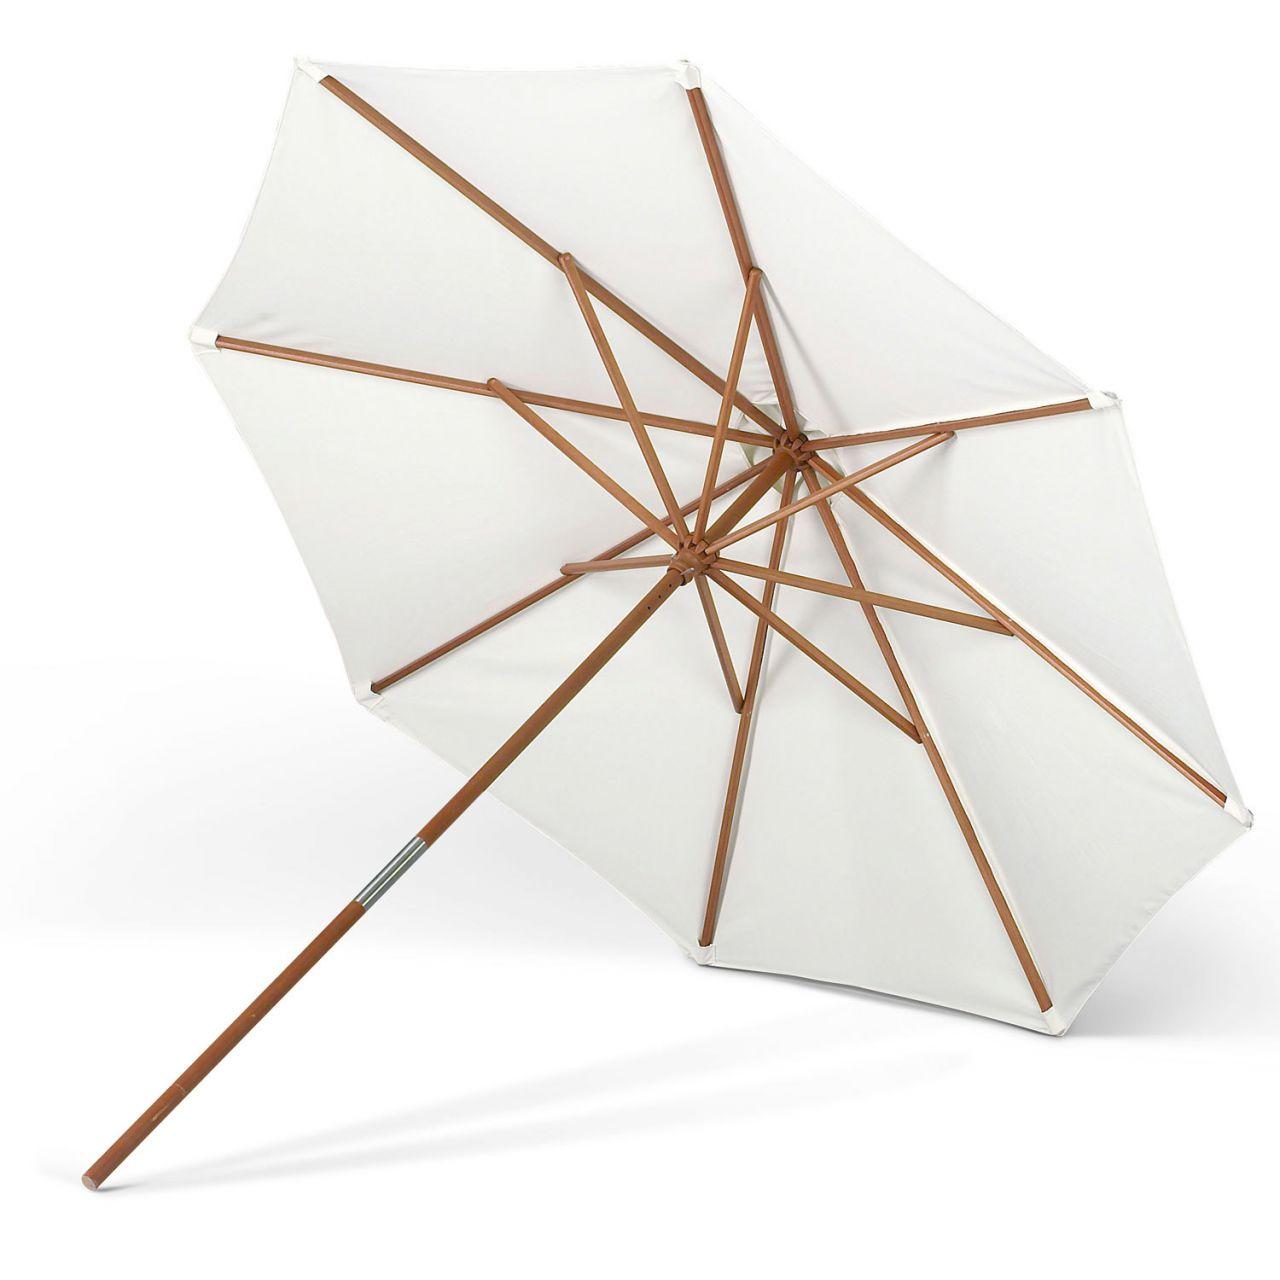 Skagerak - Catania Sonnenschirm Ø 270 cm parasol S1910130